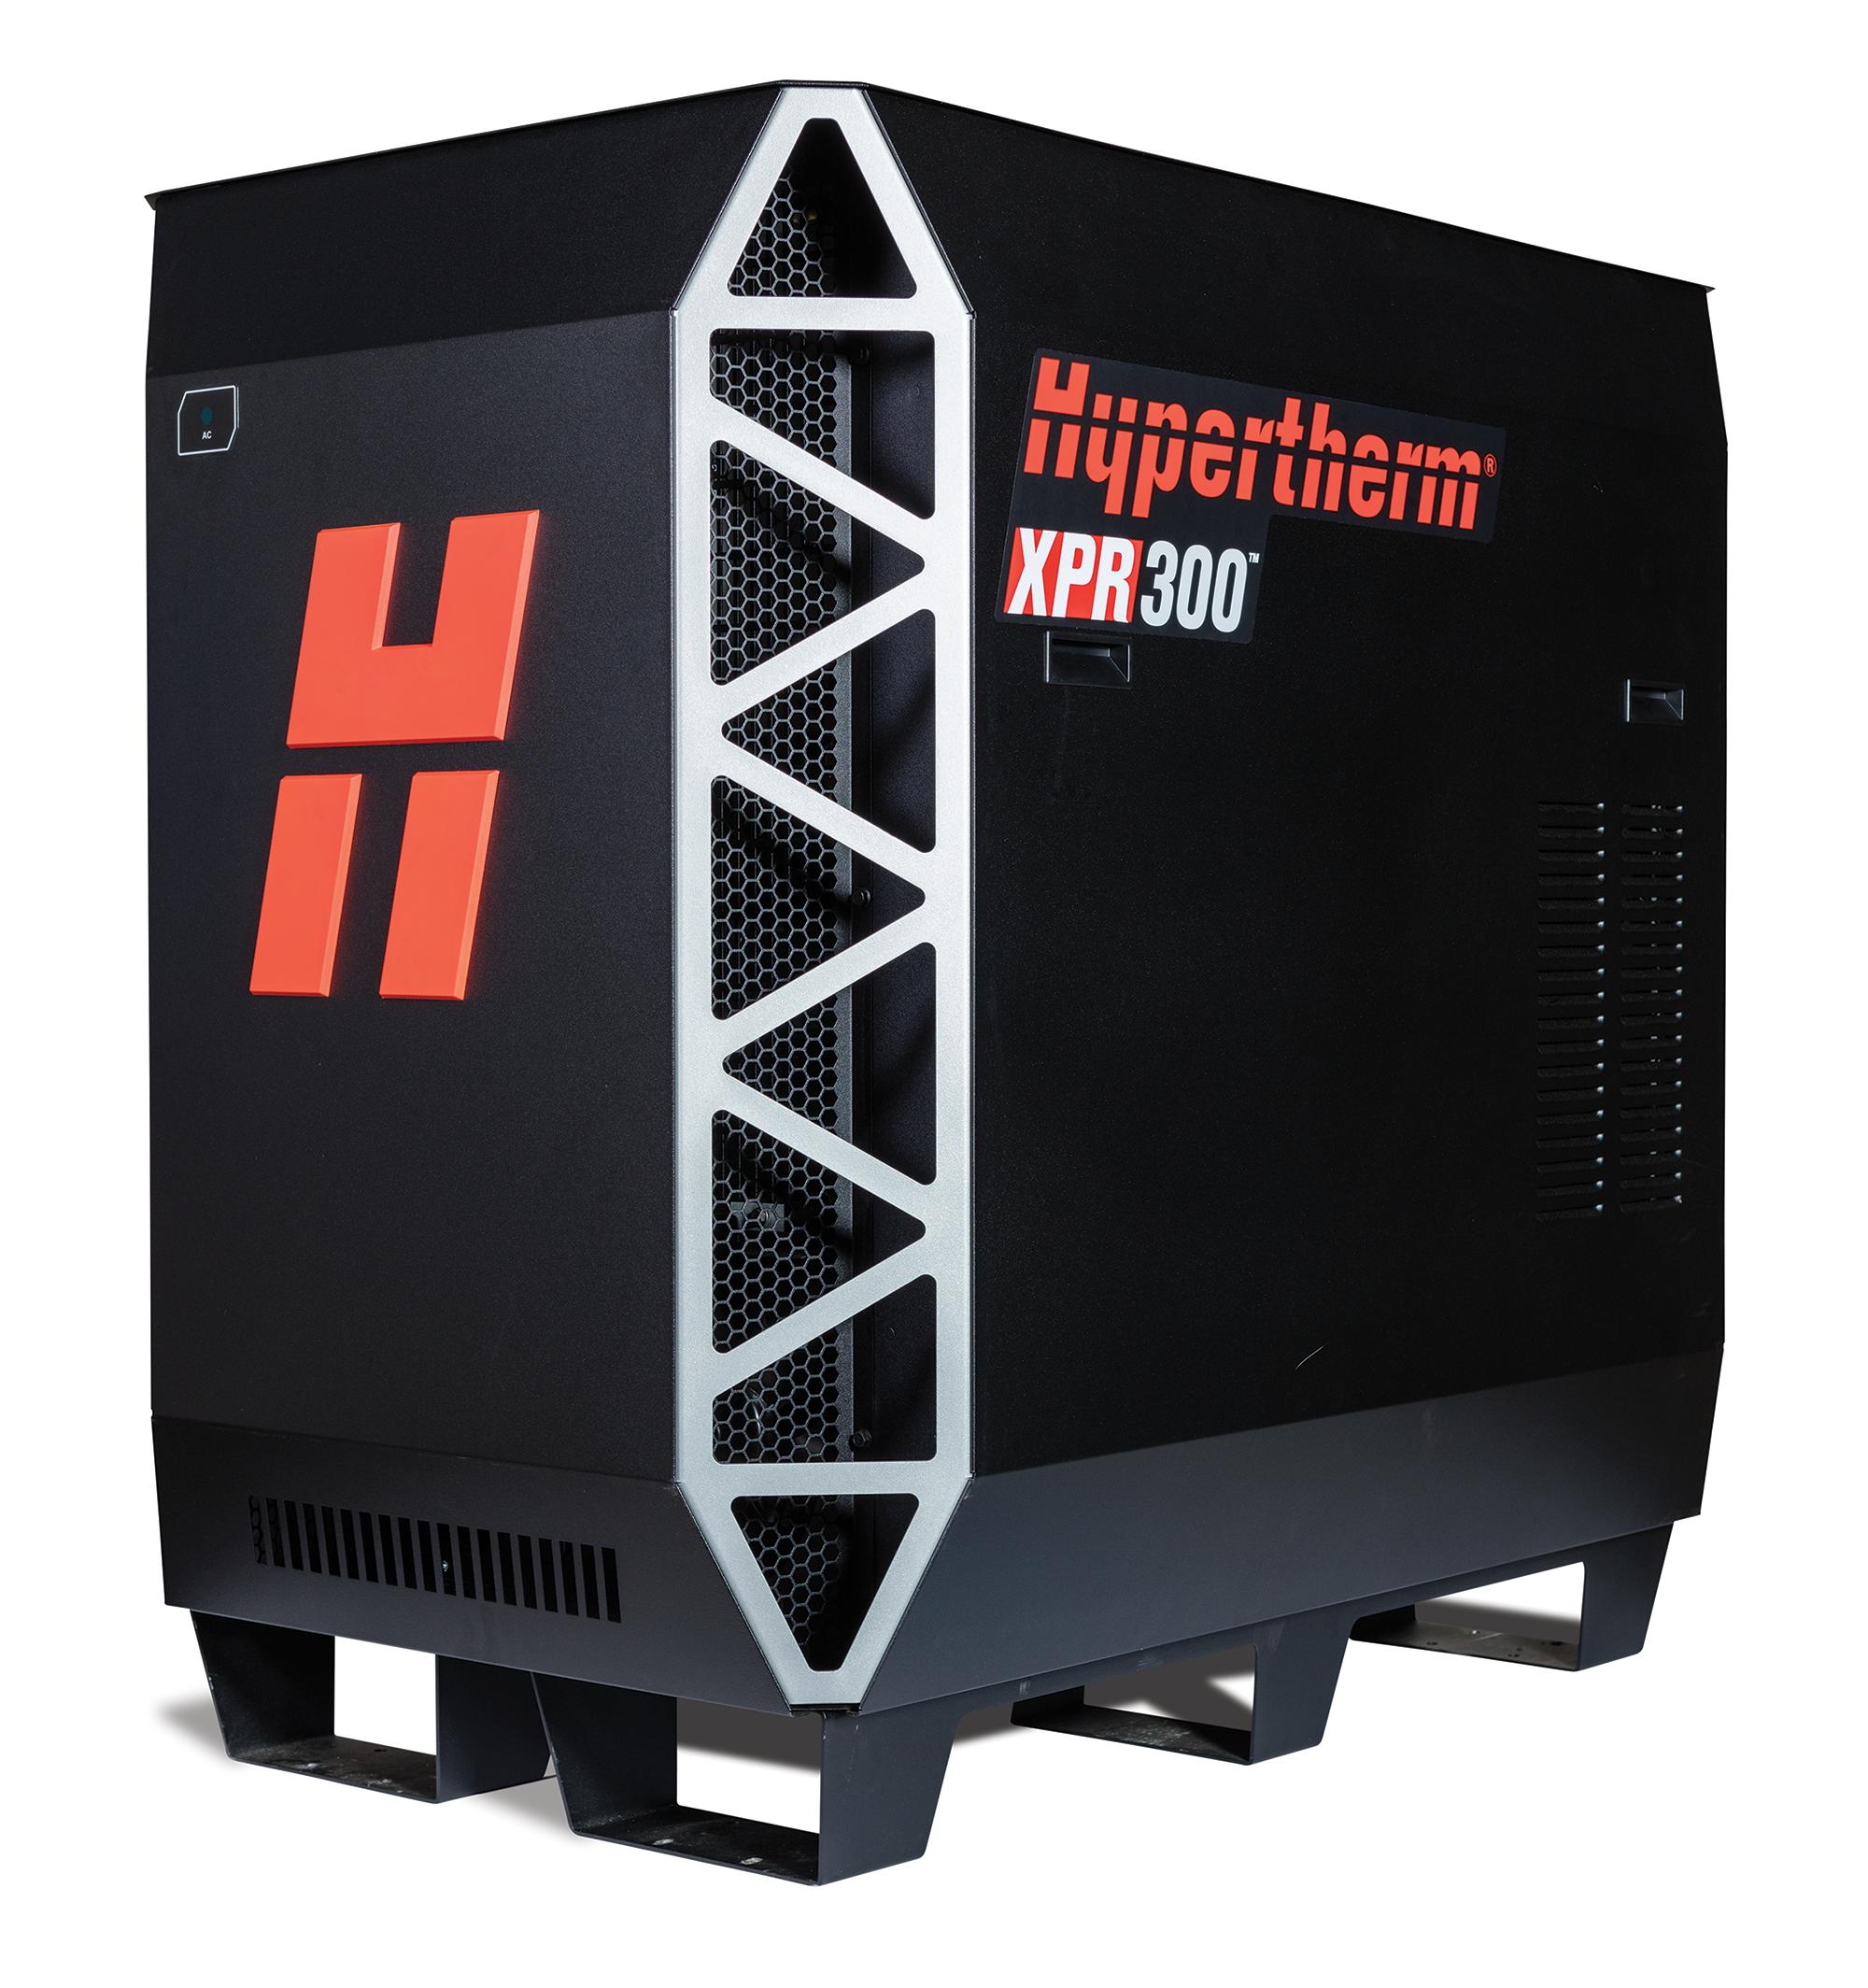 XPR300 plasma system